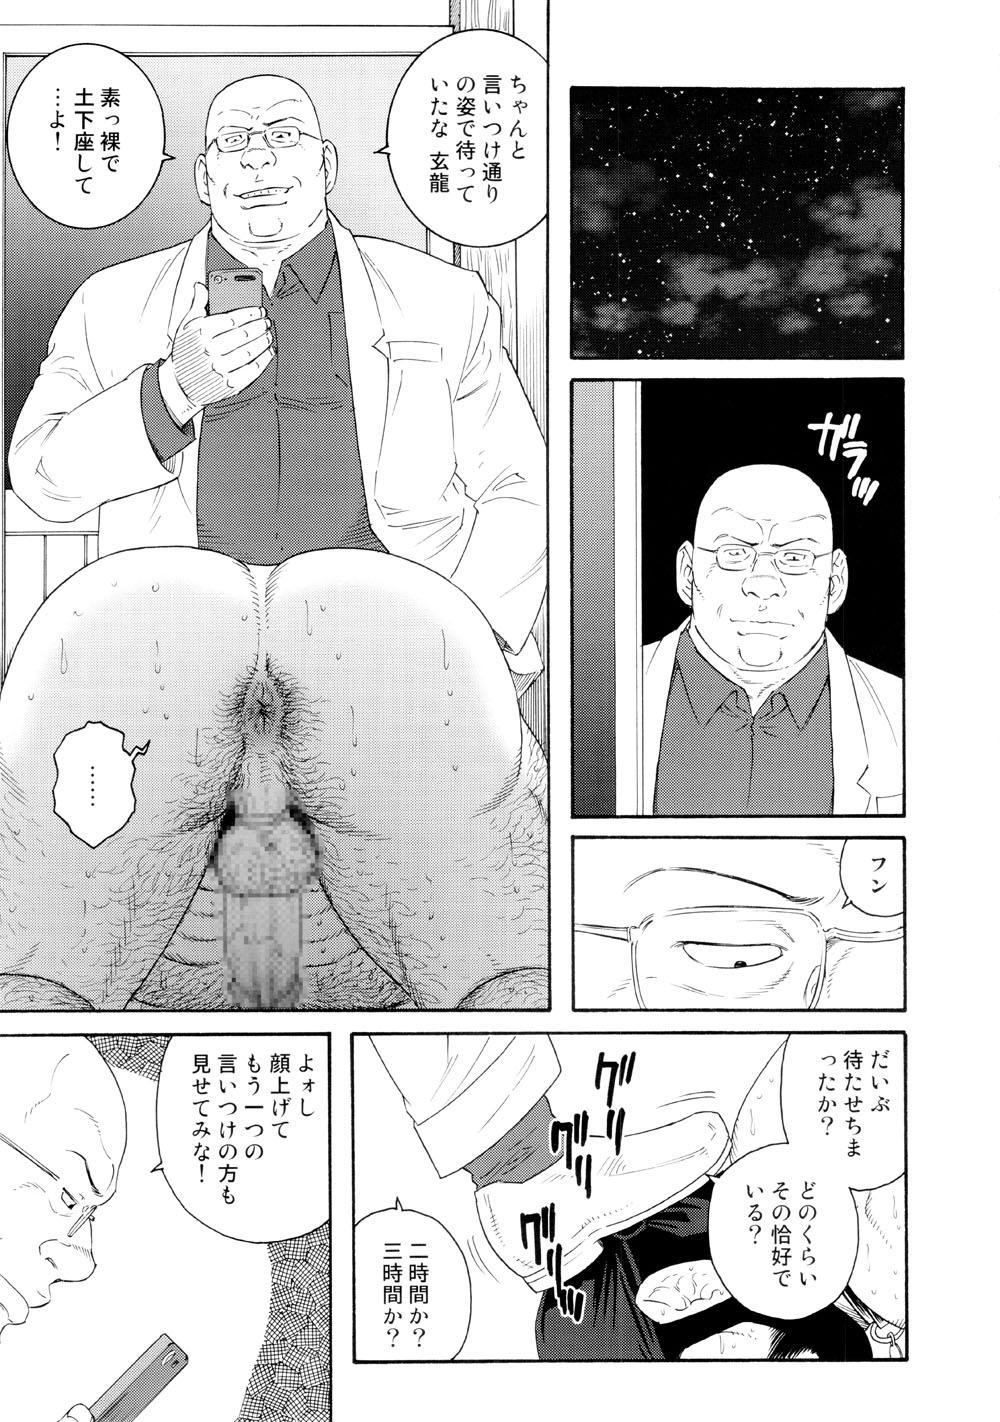 Genryu Chapter 3 6